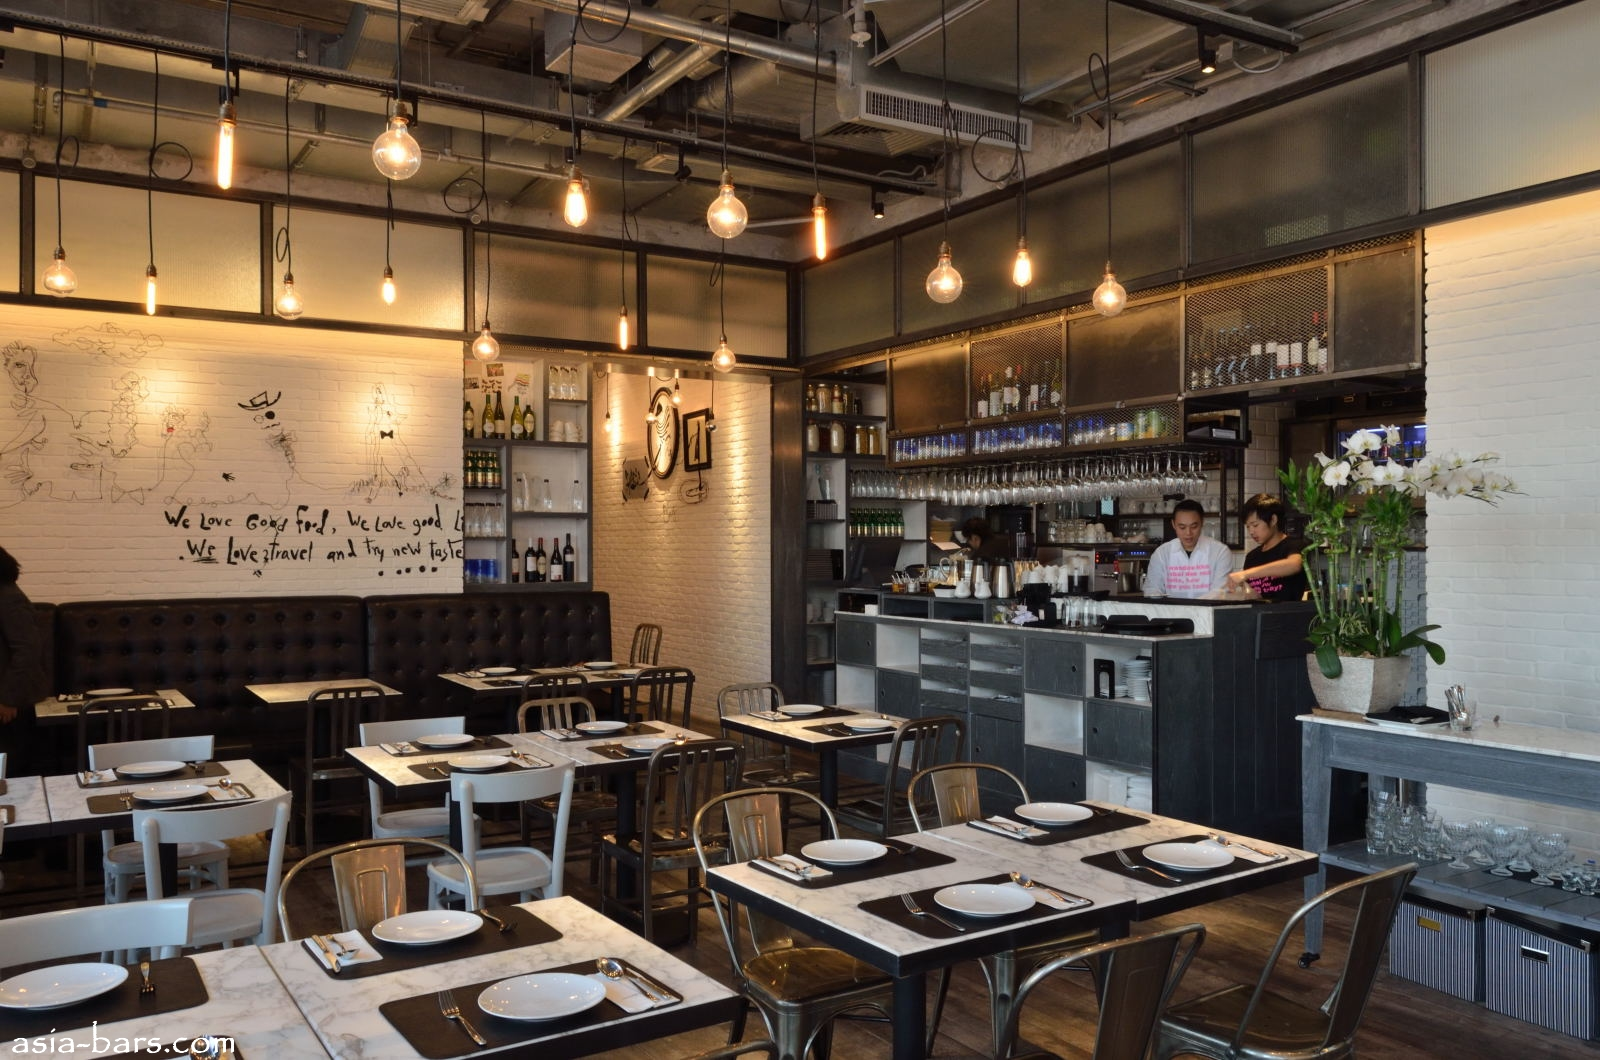 Square Kitchen Island Greyhound Cafe Ifc Mall In Hong Kong Acclaimed Bangkok